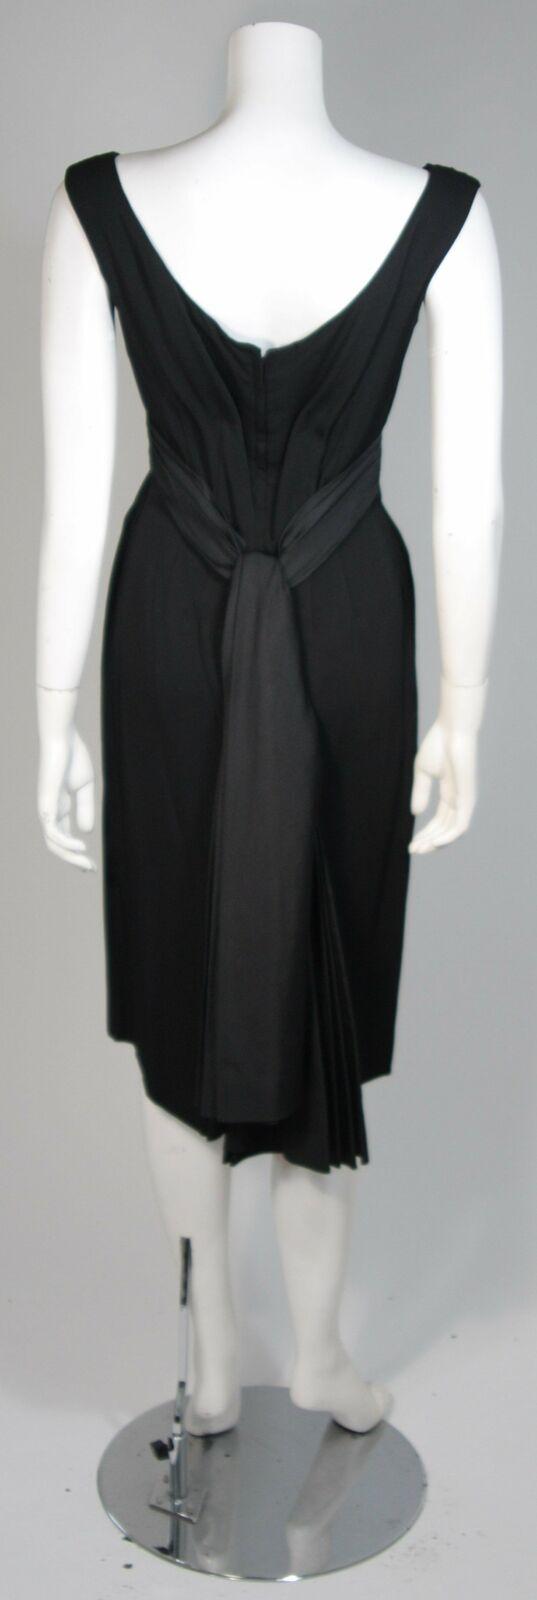 CEIL CHAPMAN 1950s Black Draped Cocktail Dress Si… - image 7